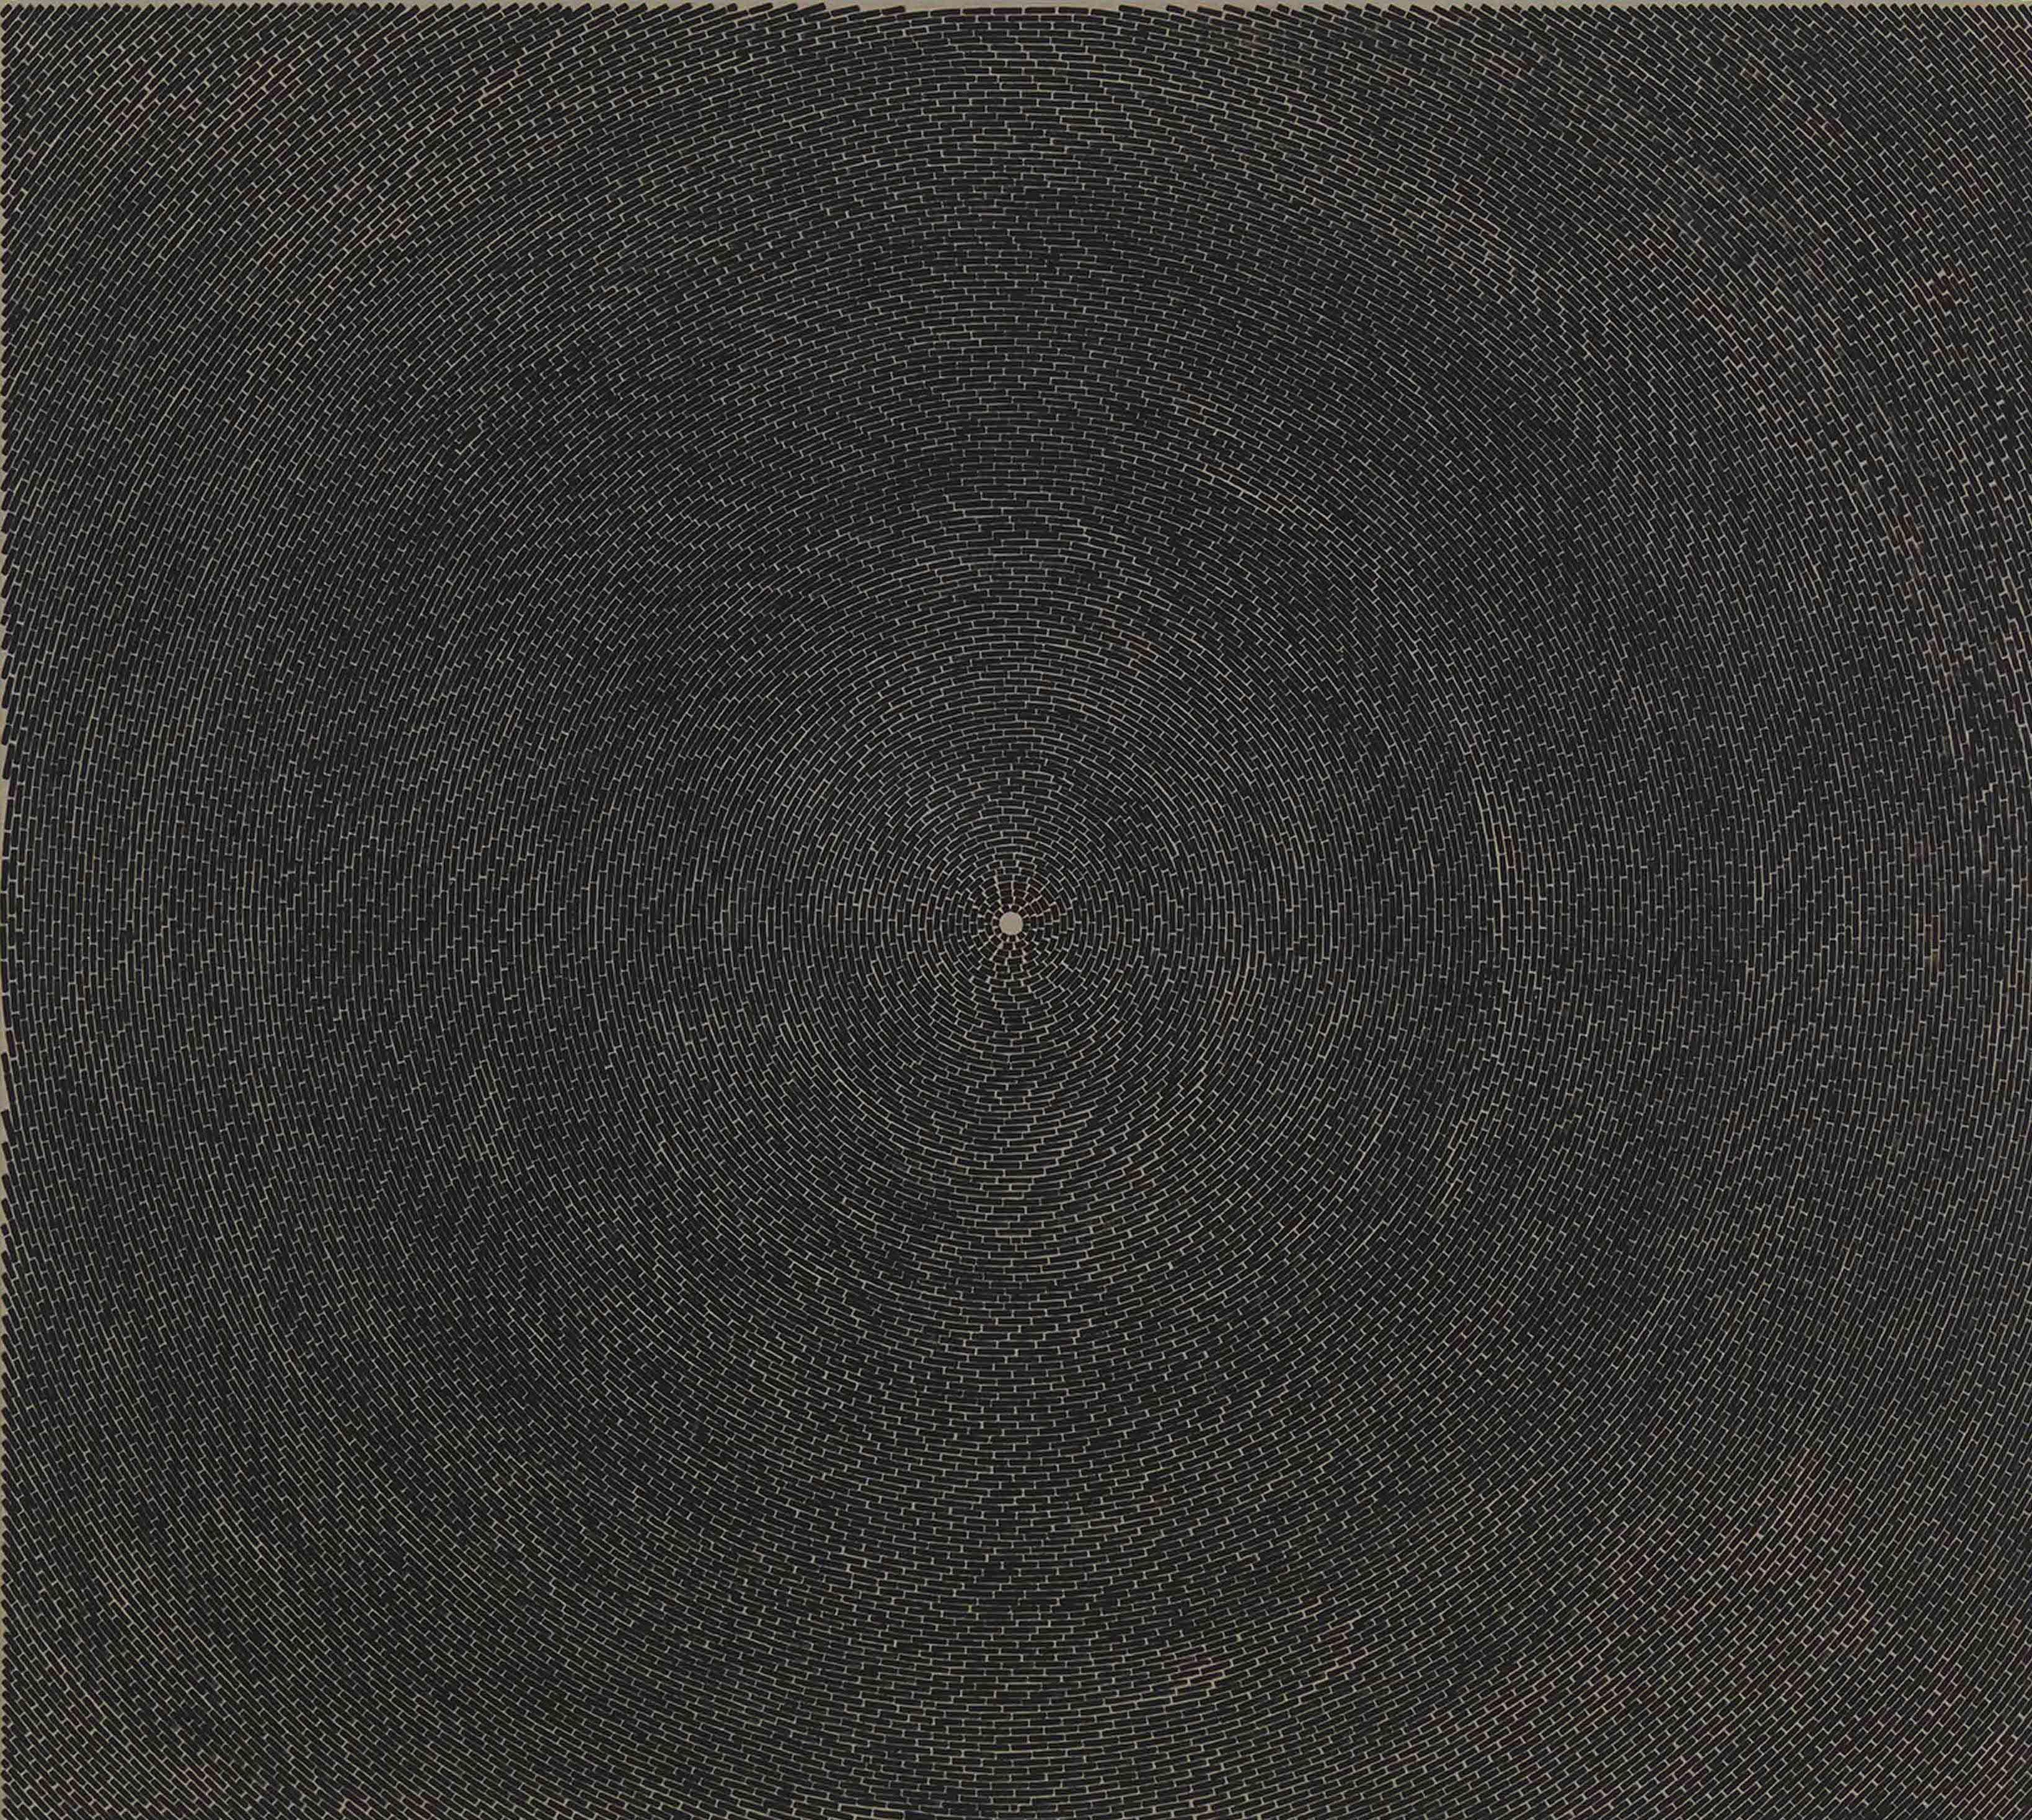 Y. Z Kami, Geometry of Light, Gagosian Gallery